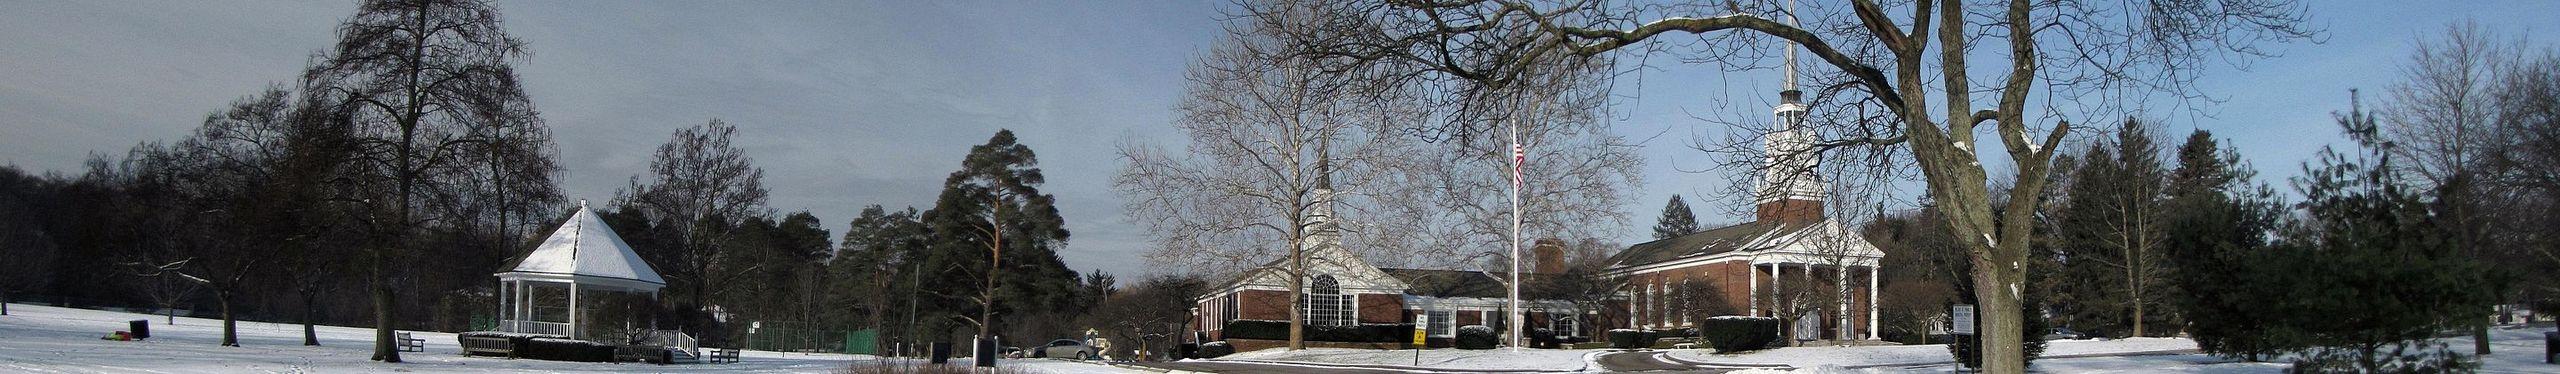 Michigan oakland county franklin - Franklin